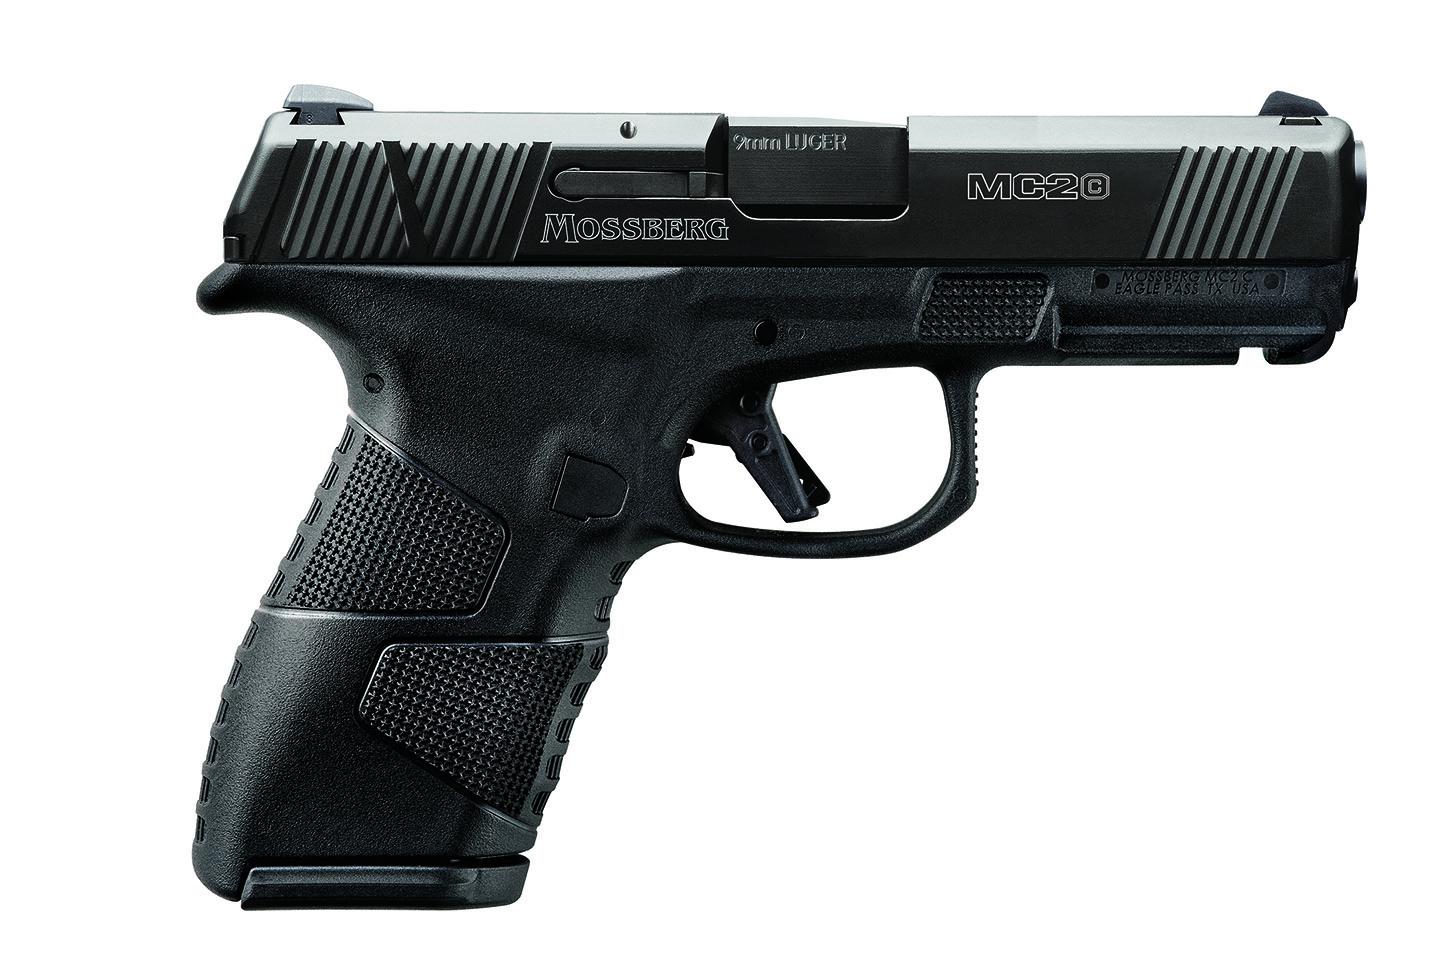 Mossberg MC-2c 9mm